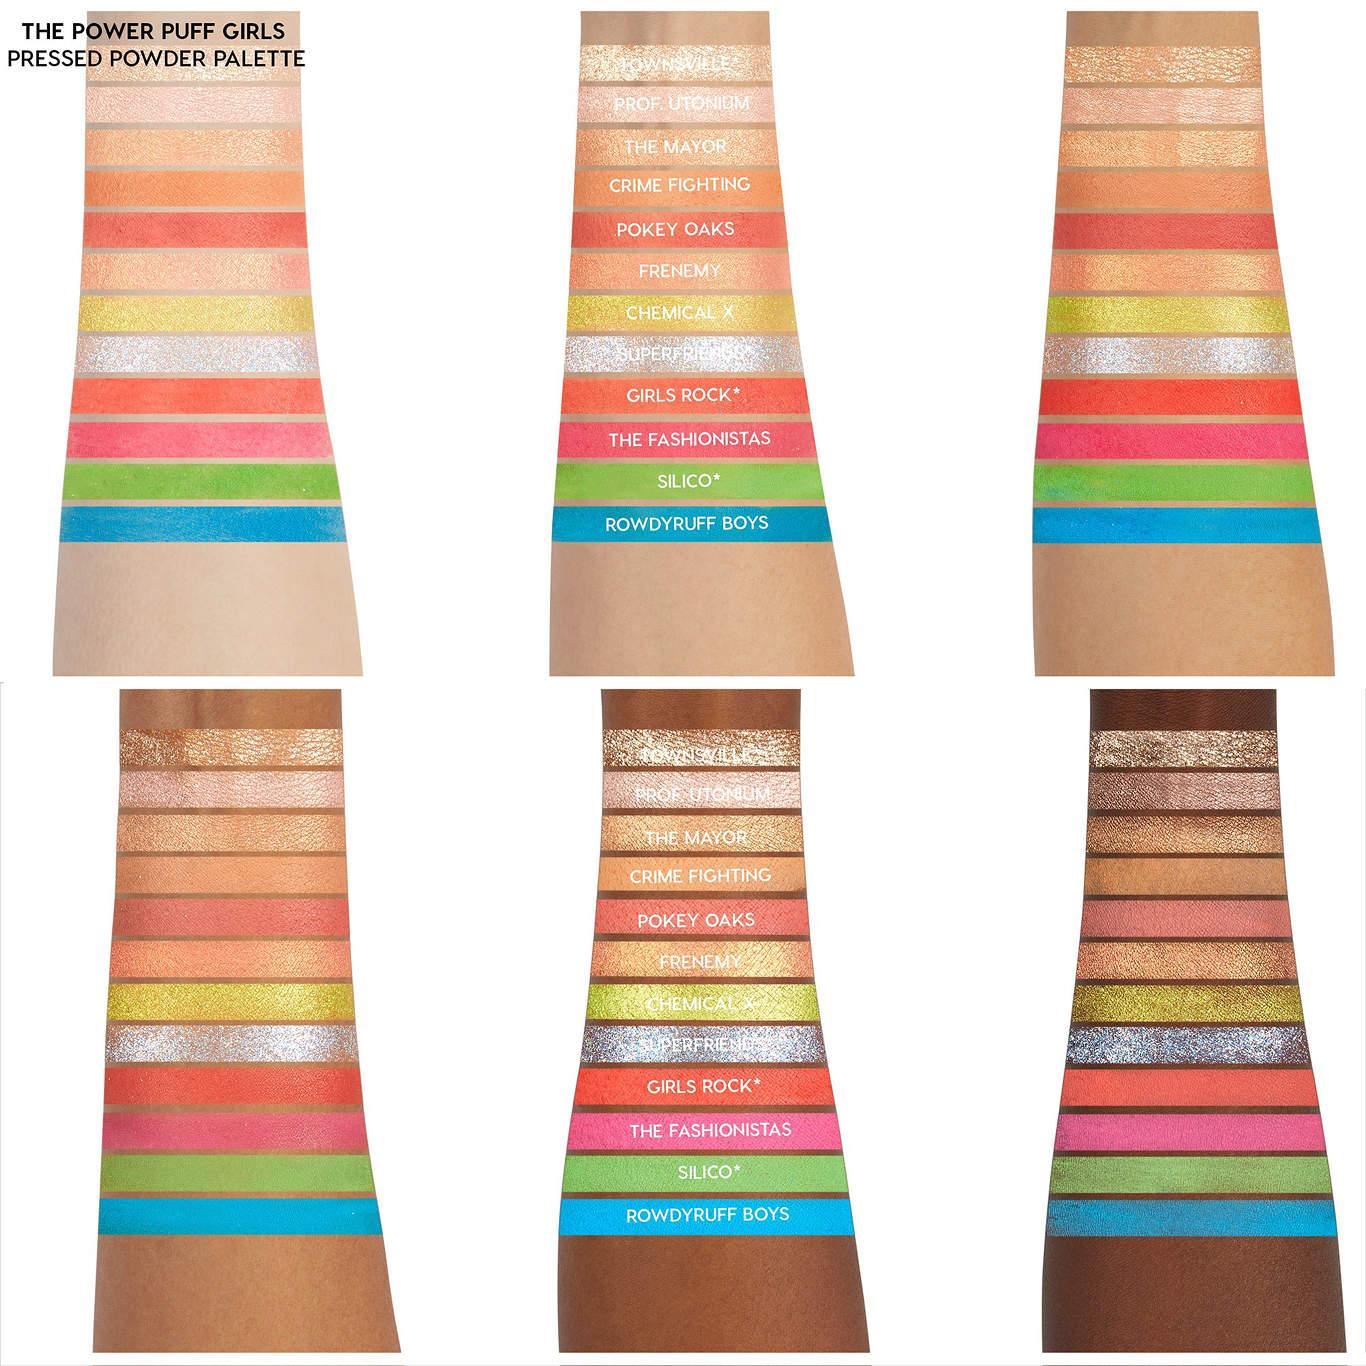 ColourPop Cosmetics The Powerpuff Girls x ColourPop Collection 12 Pan Palette Swatches